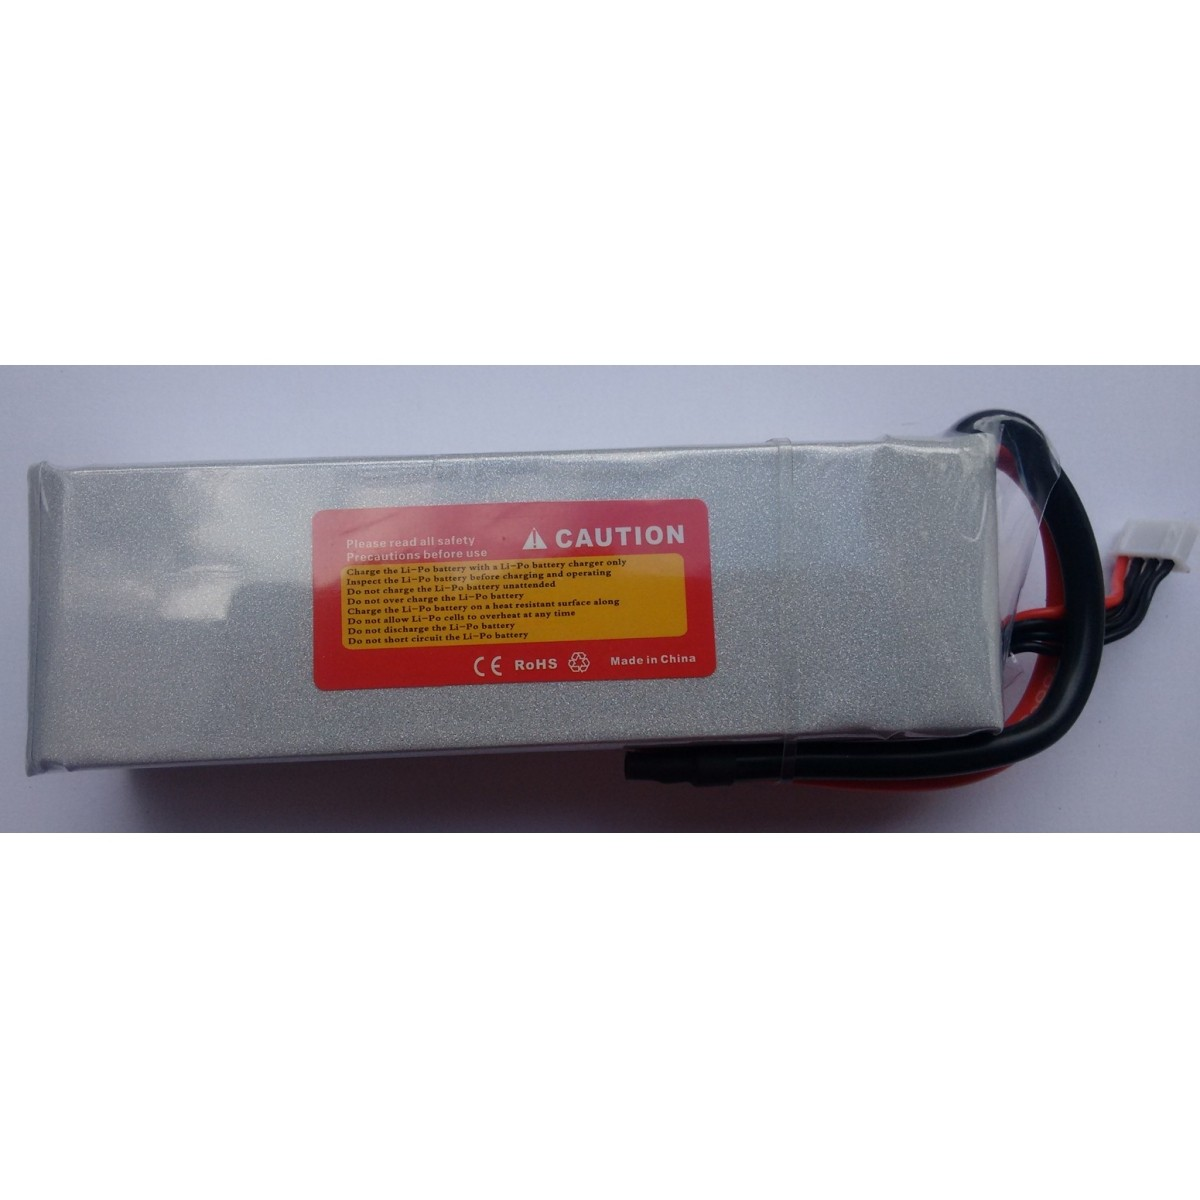 JHP52001130 - Bateria LiPo 5200mah 11.1v 30C